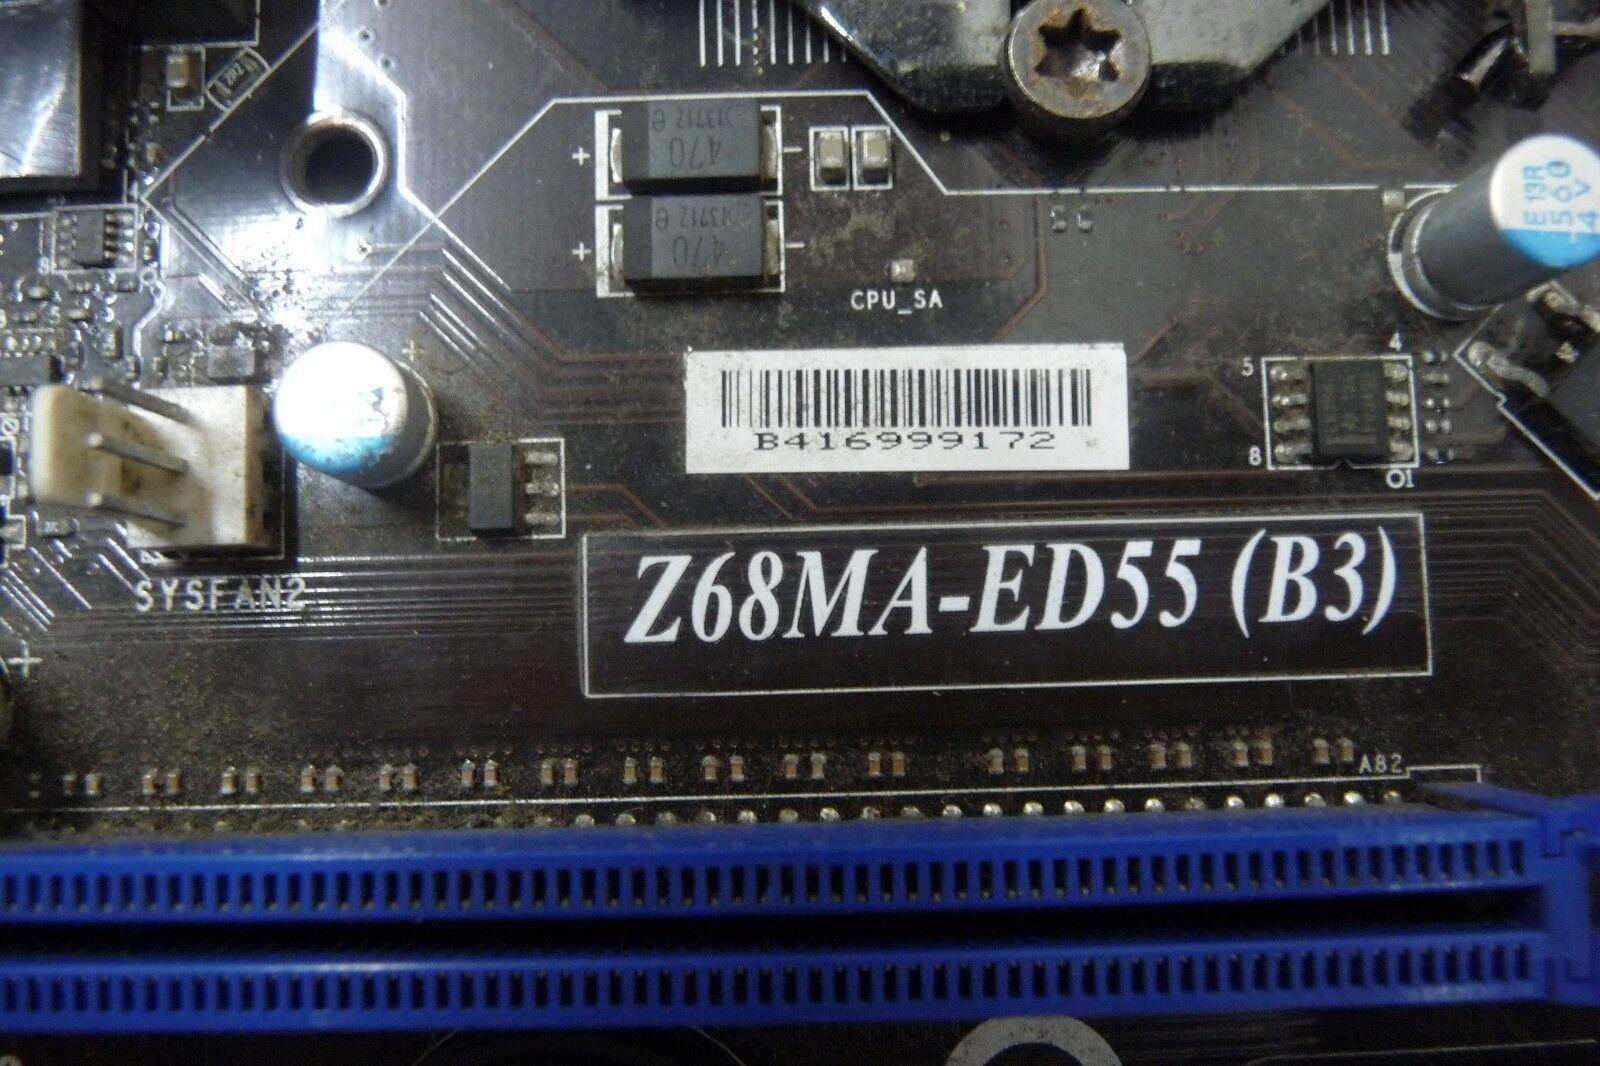 MSI Z68MA-ED55 (B3) REALTEK LAN DRIVER FOR WINDOWS 7